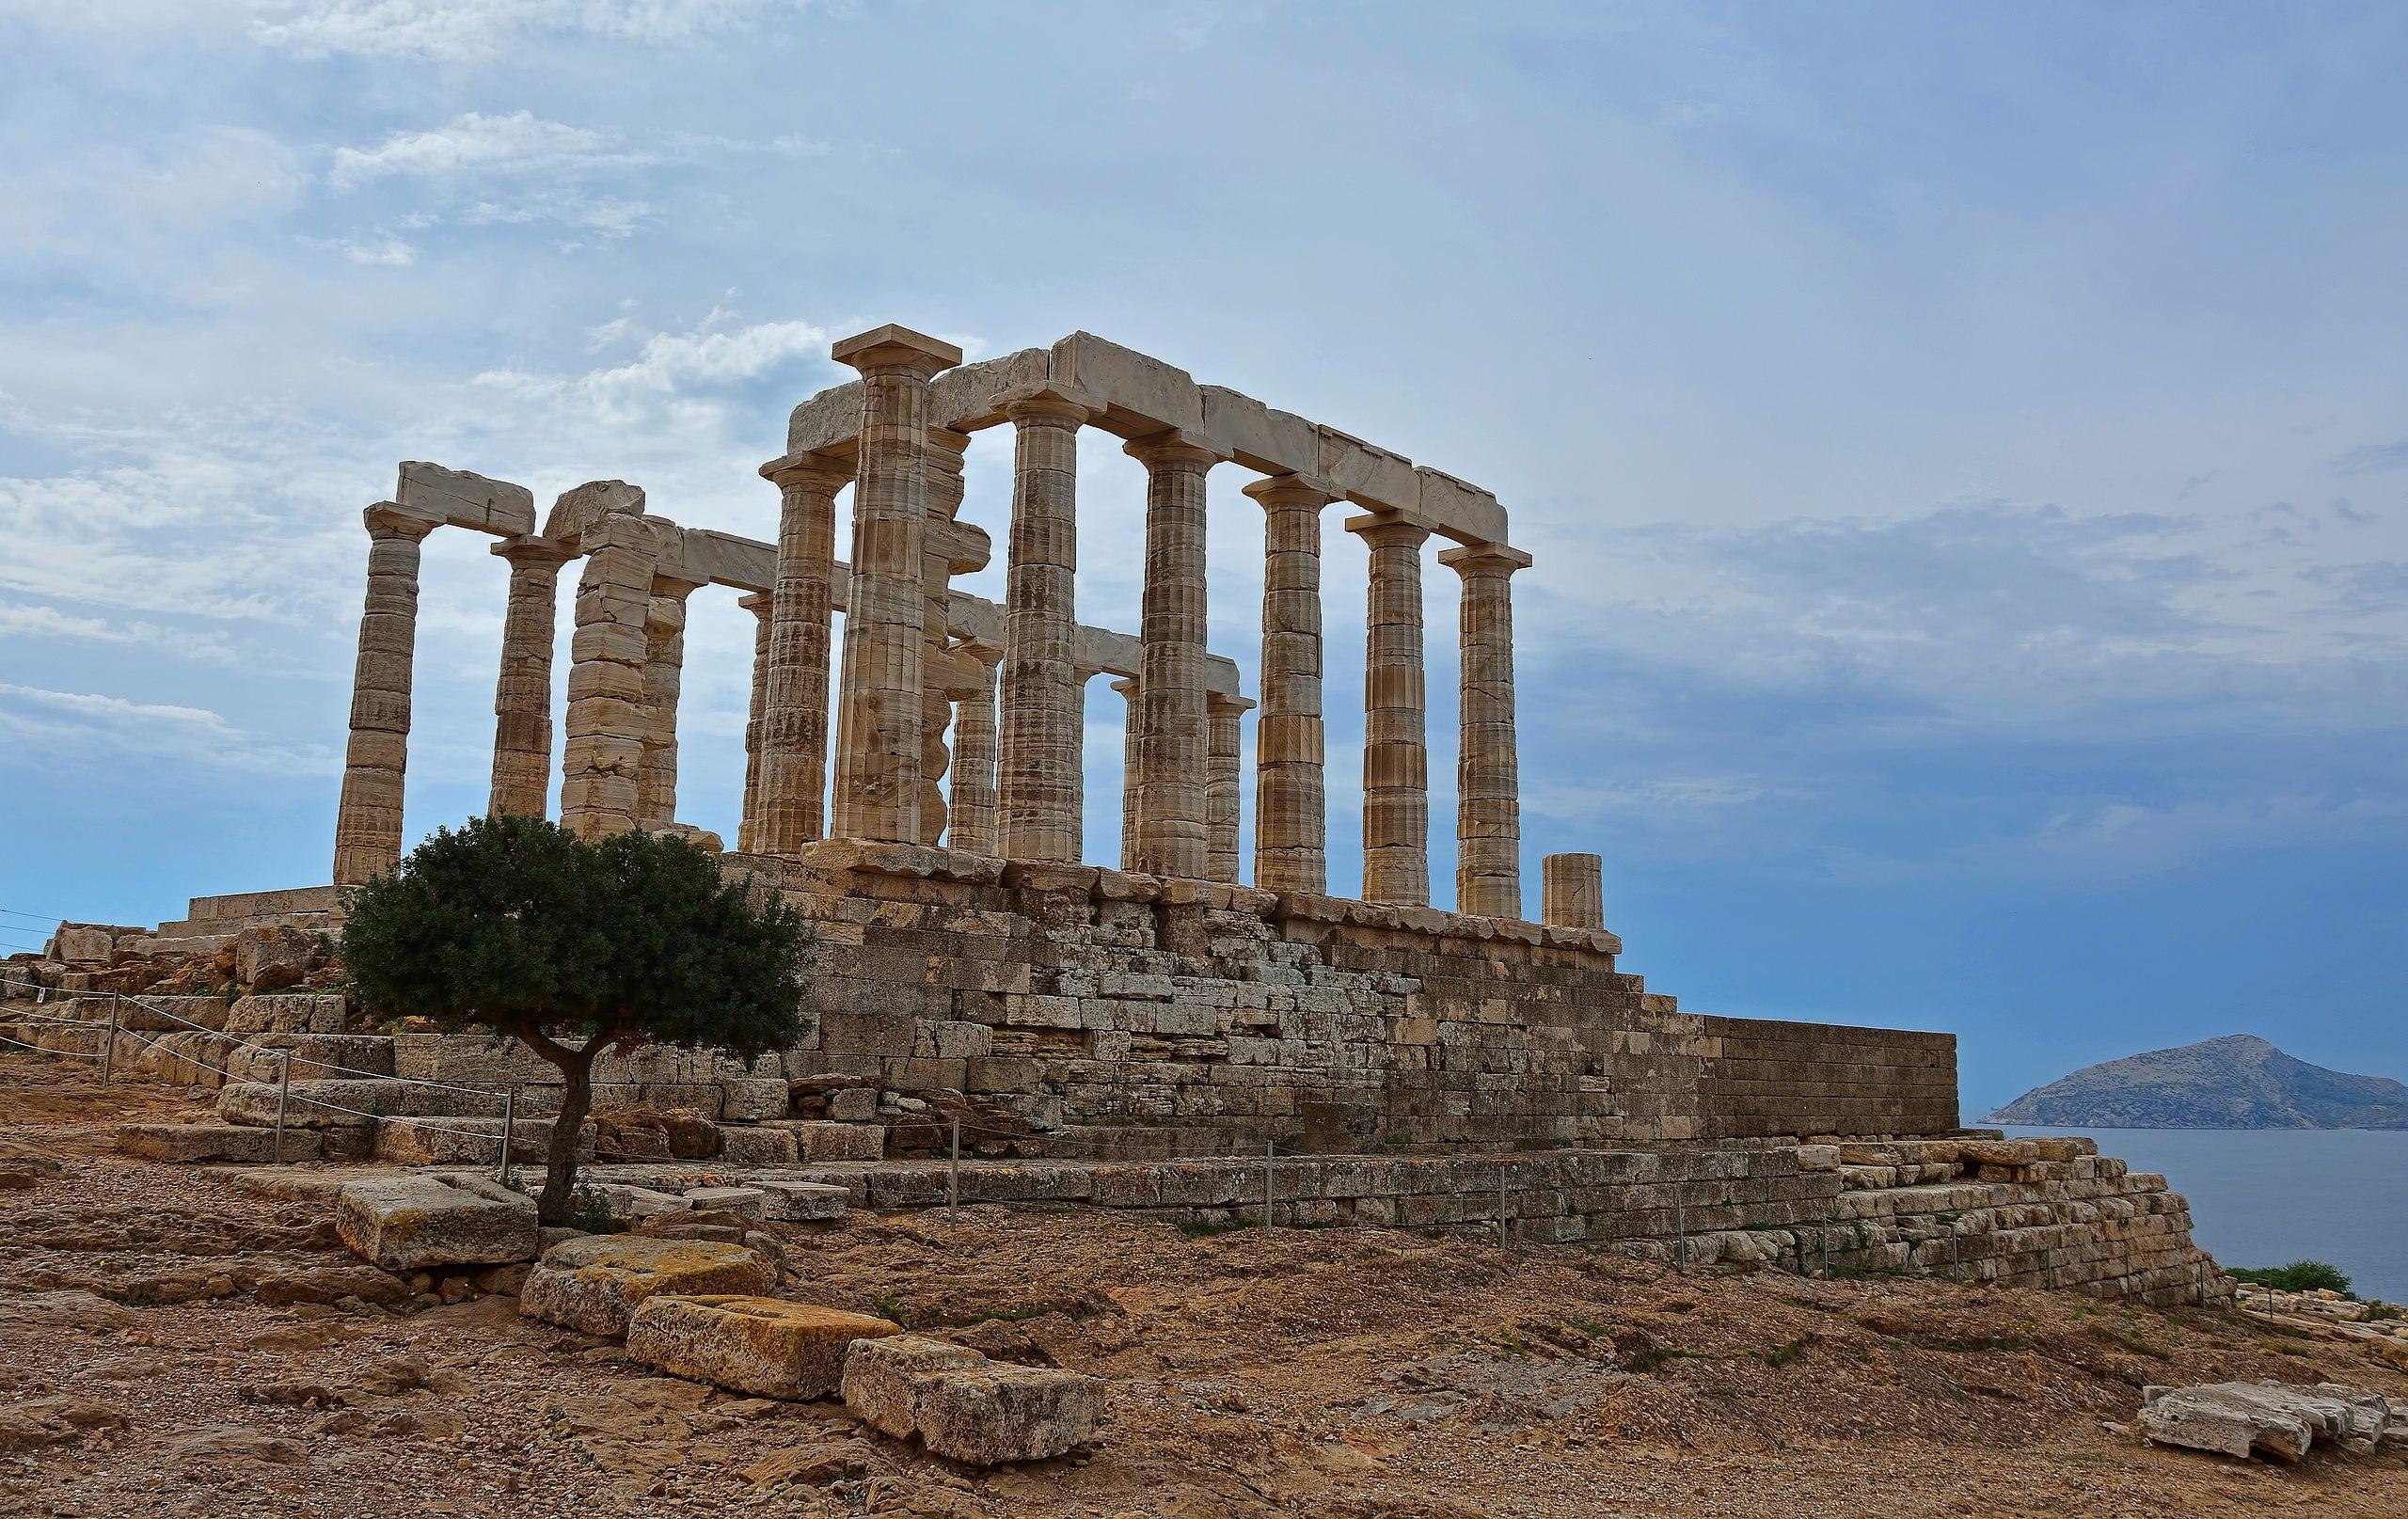 cape sounio temple of poseidon